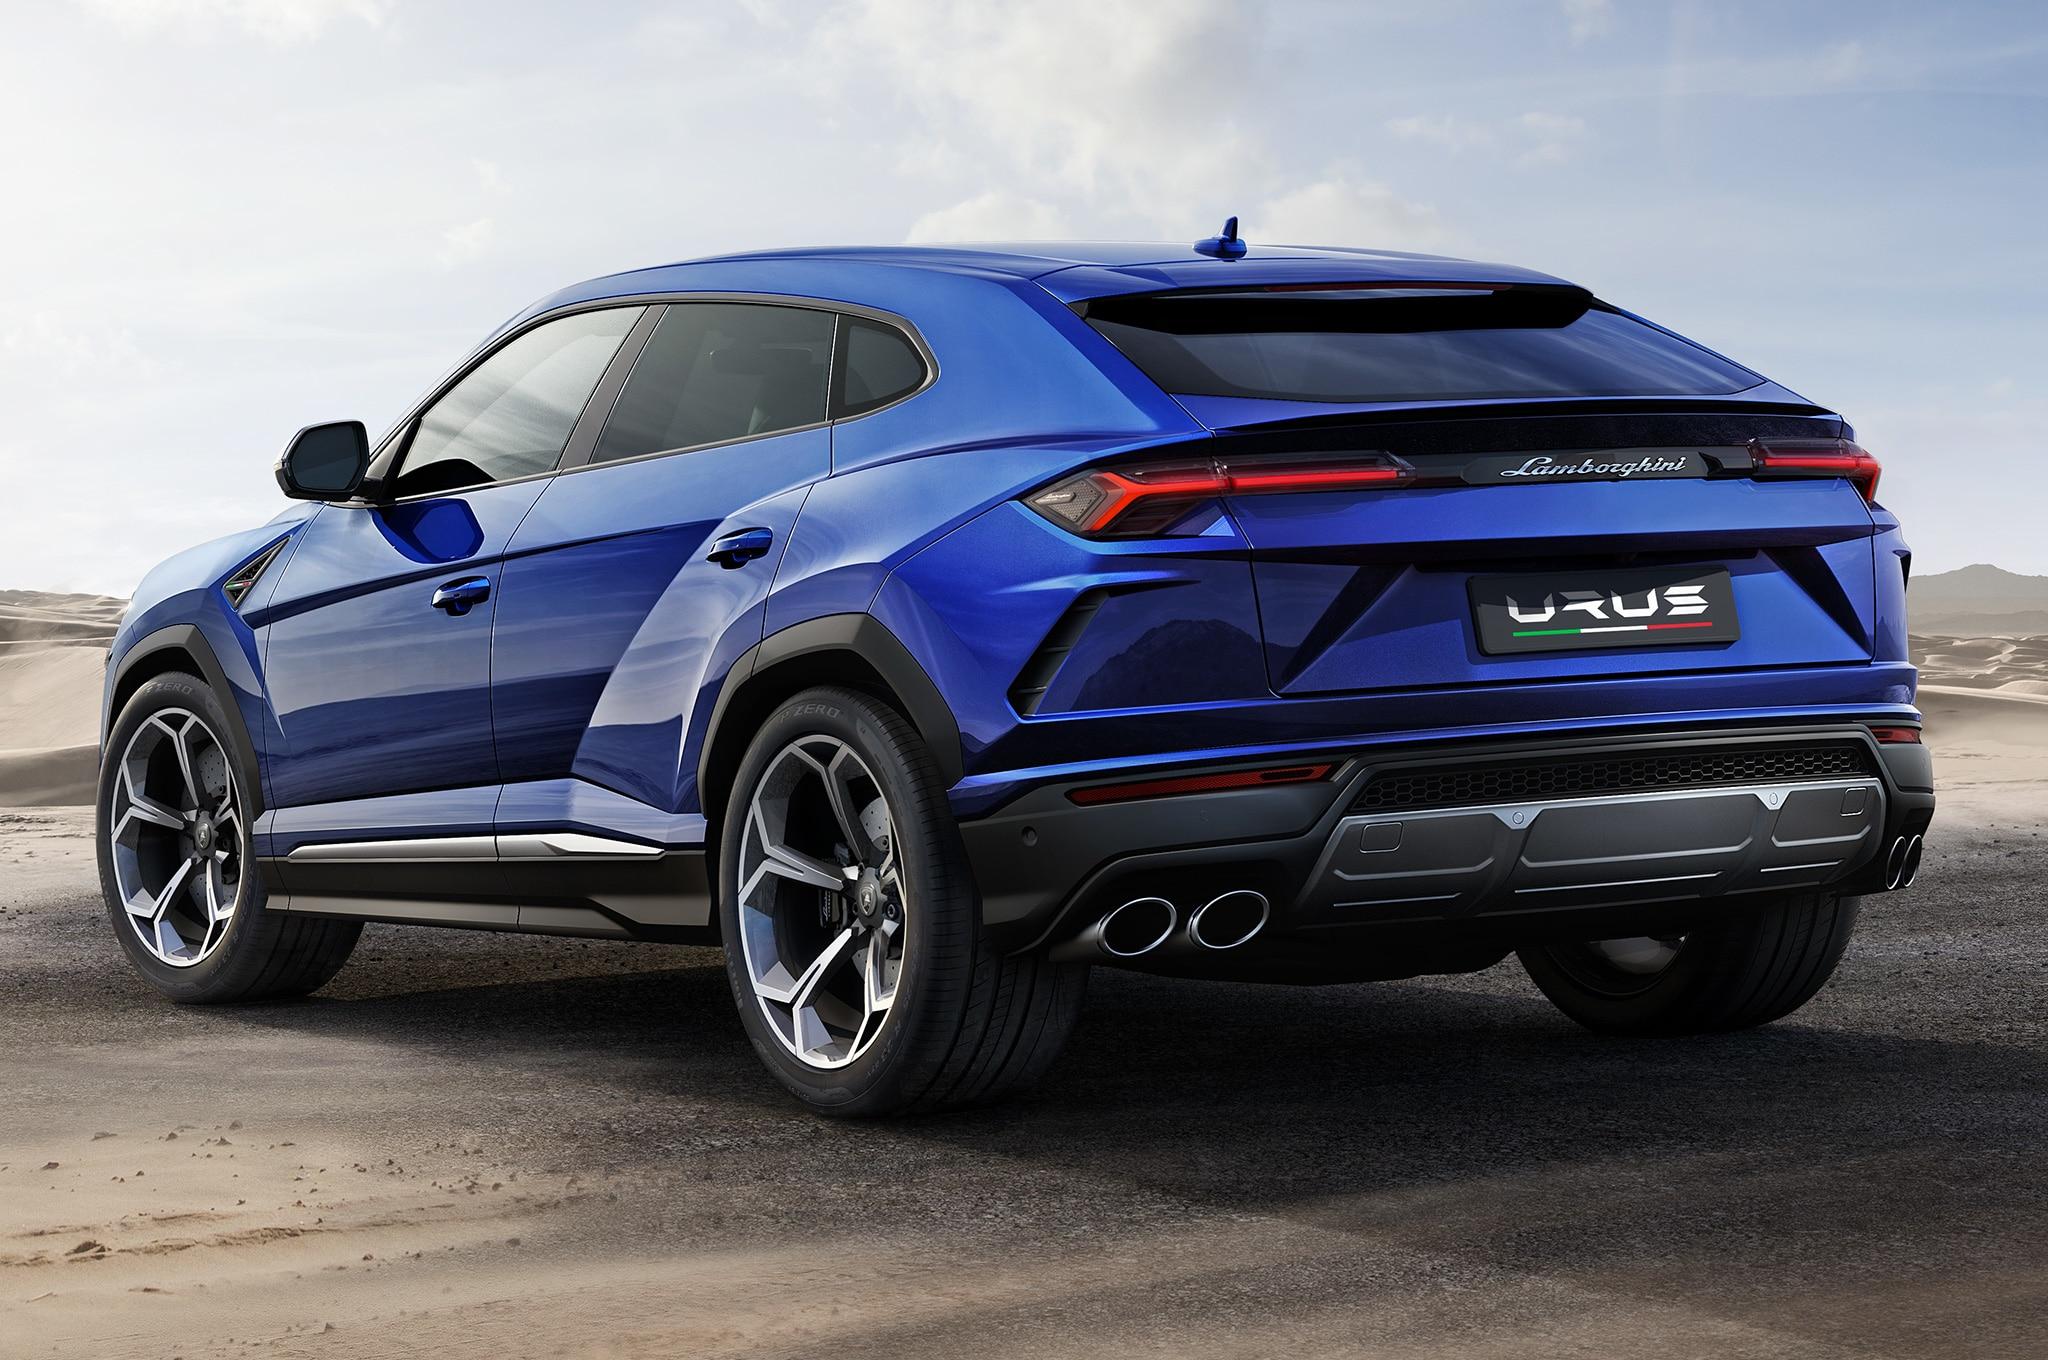 2019-Lamborghini-Urus-rear-side-view-parked.jpg